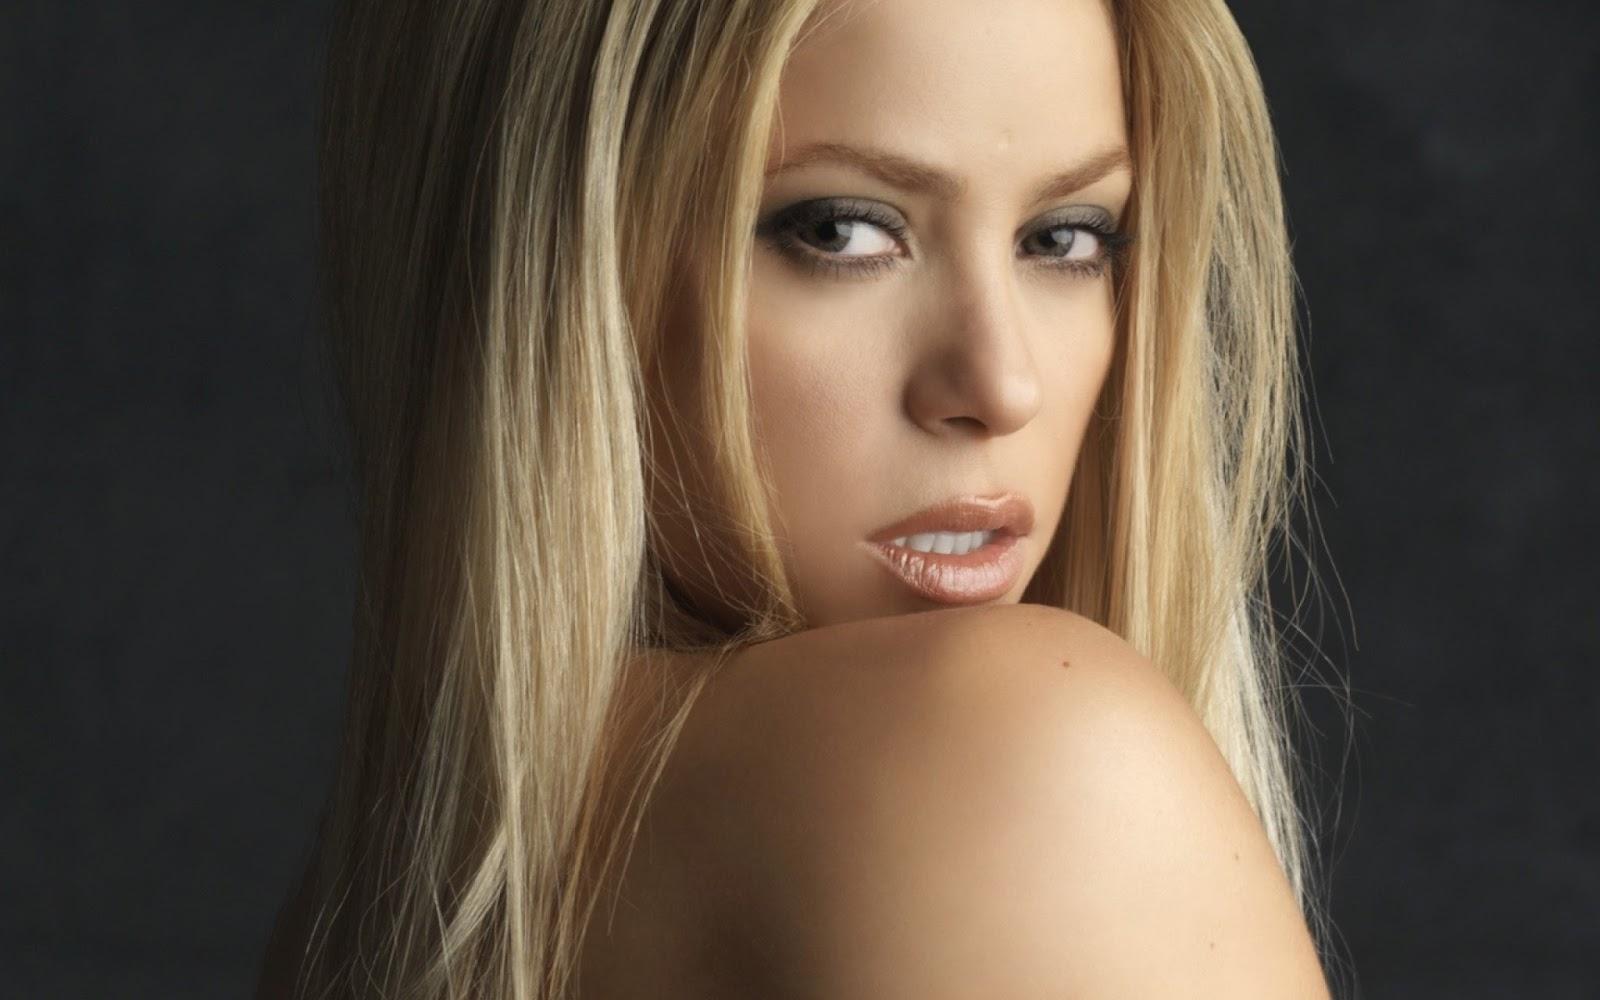 Hd Diwali Wallpapers Free Lovable Images Beautiful Shakira Hd Wallpapers Free